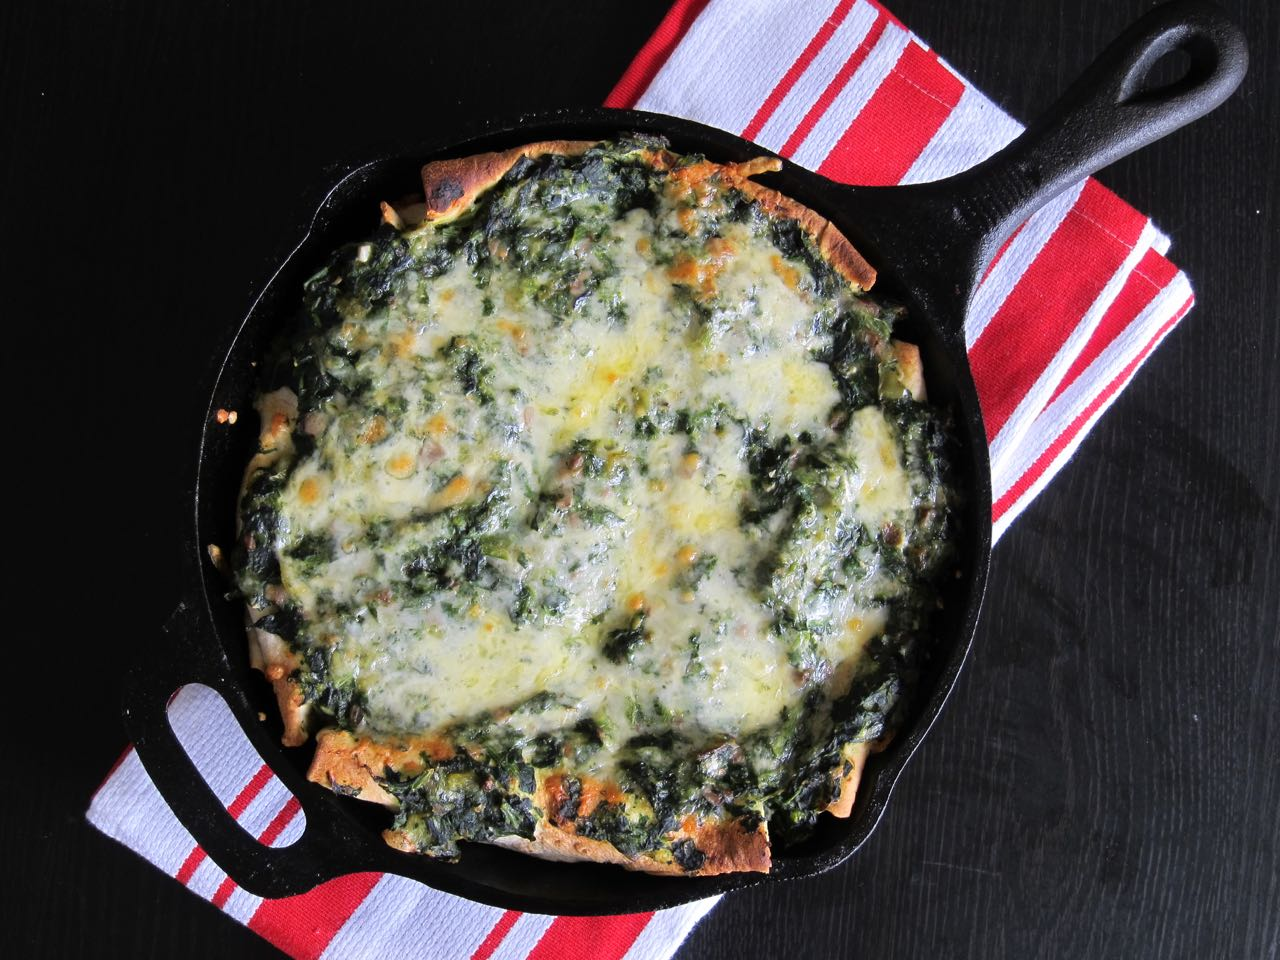 Green Chile Spinach, Cheese & Mushroom Enchiladas